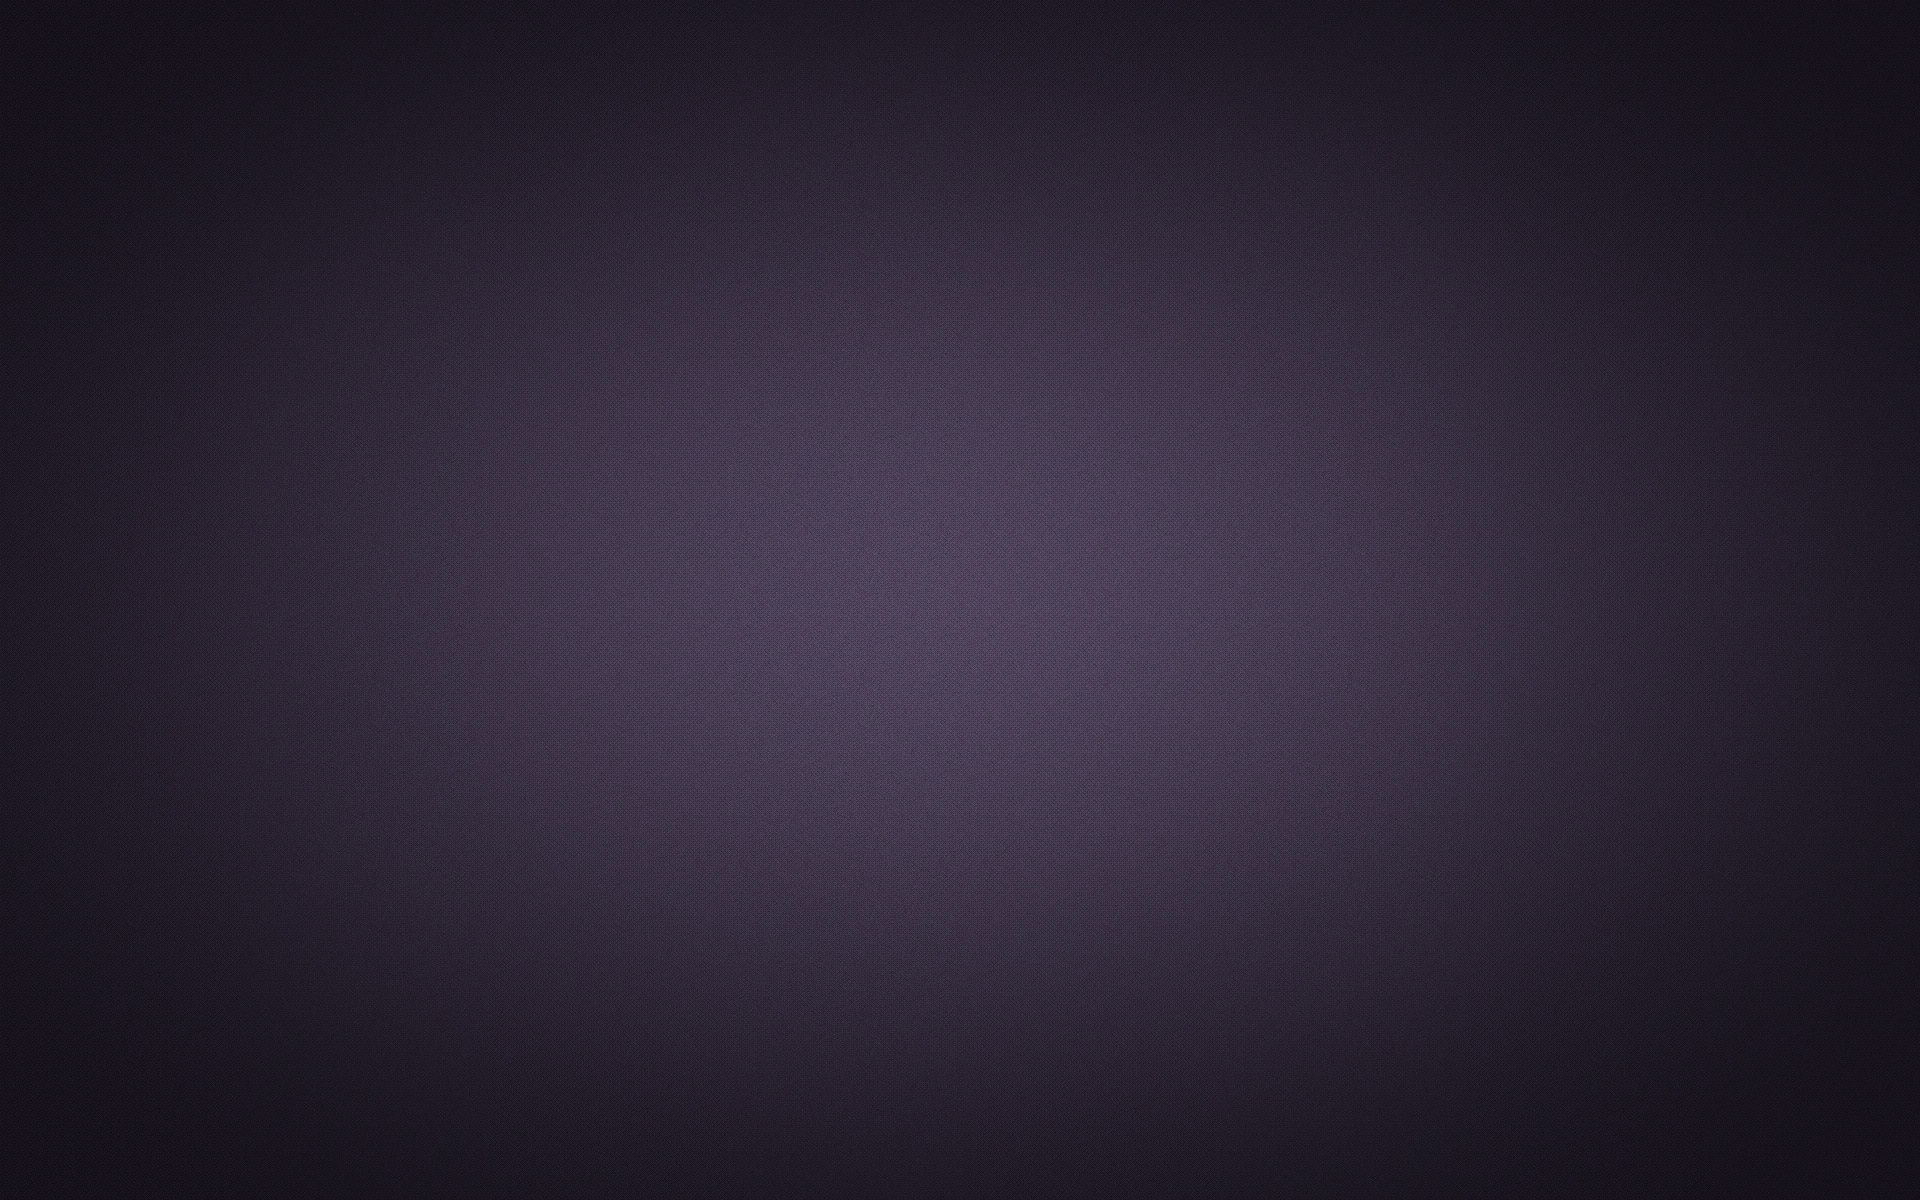 Background_Purple.jpg